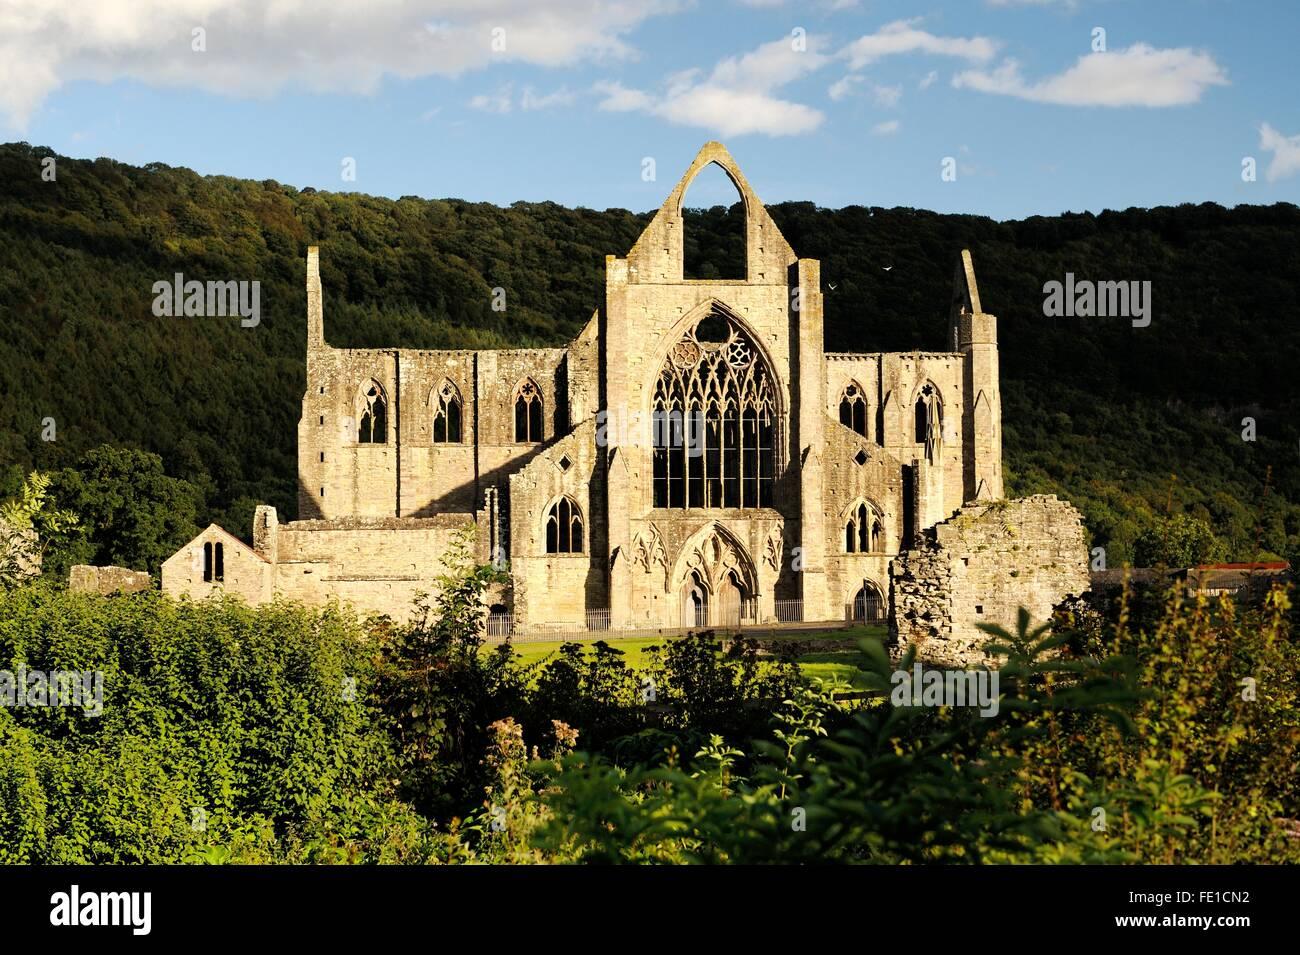 Abbaye de Tintern dans la vallée de la Wye, Monmouthshire, Wales, UK. Christian cistercienne monastère Photo Stock